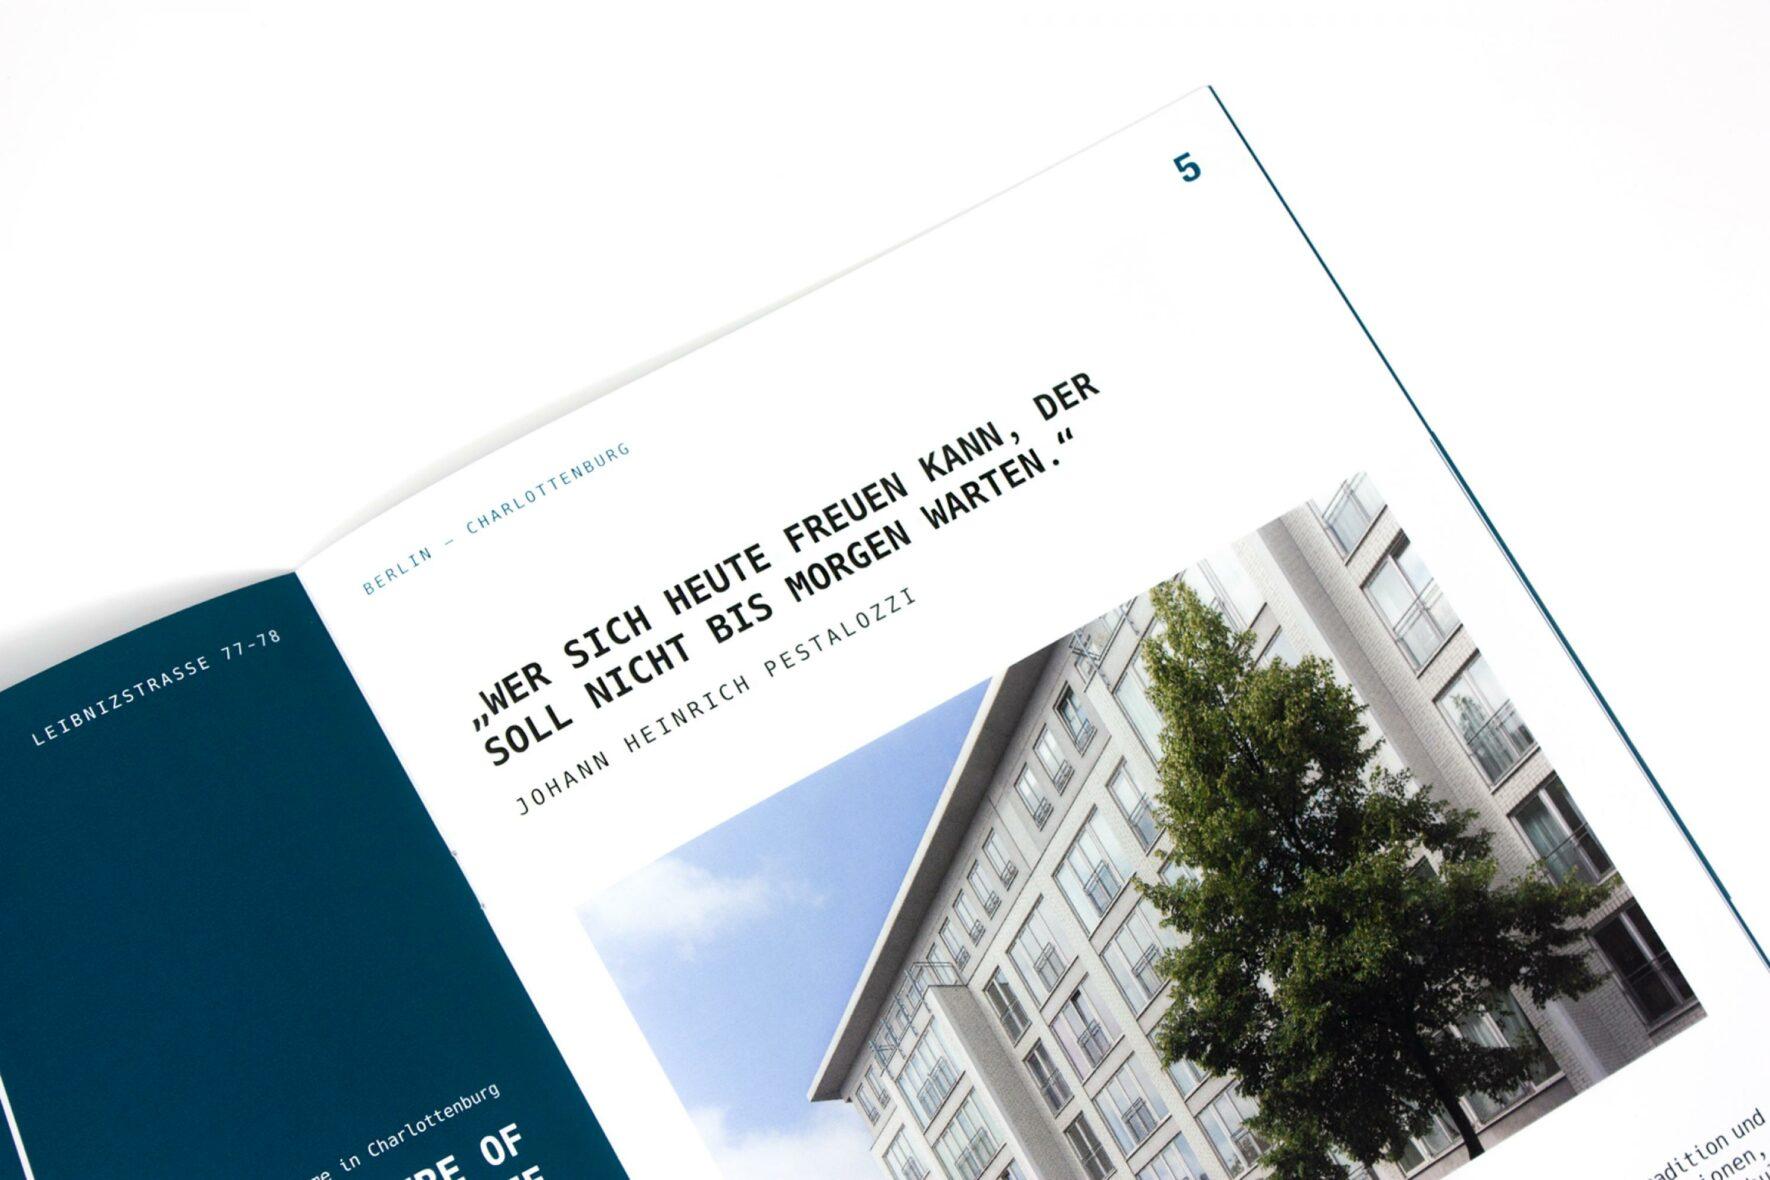 Broschuere-Leibniz-Immobilienbranding-Trendcity-FORMLOS-berlin-Print42